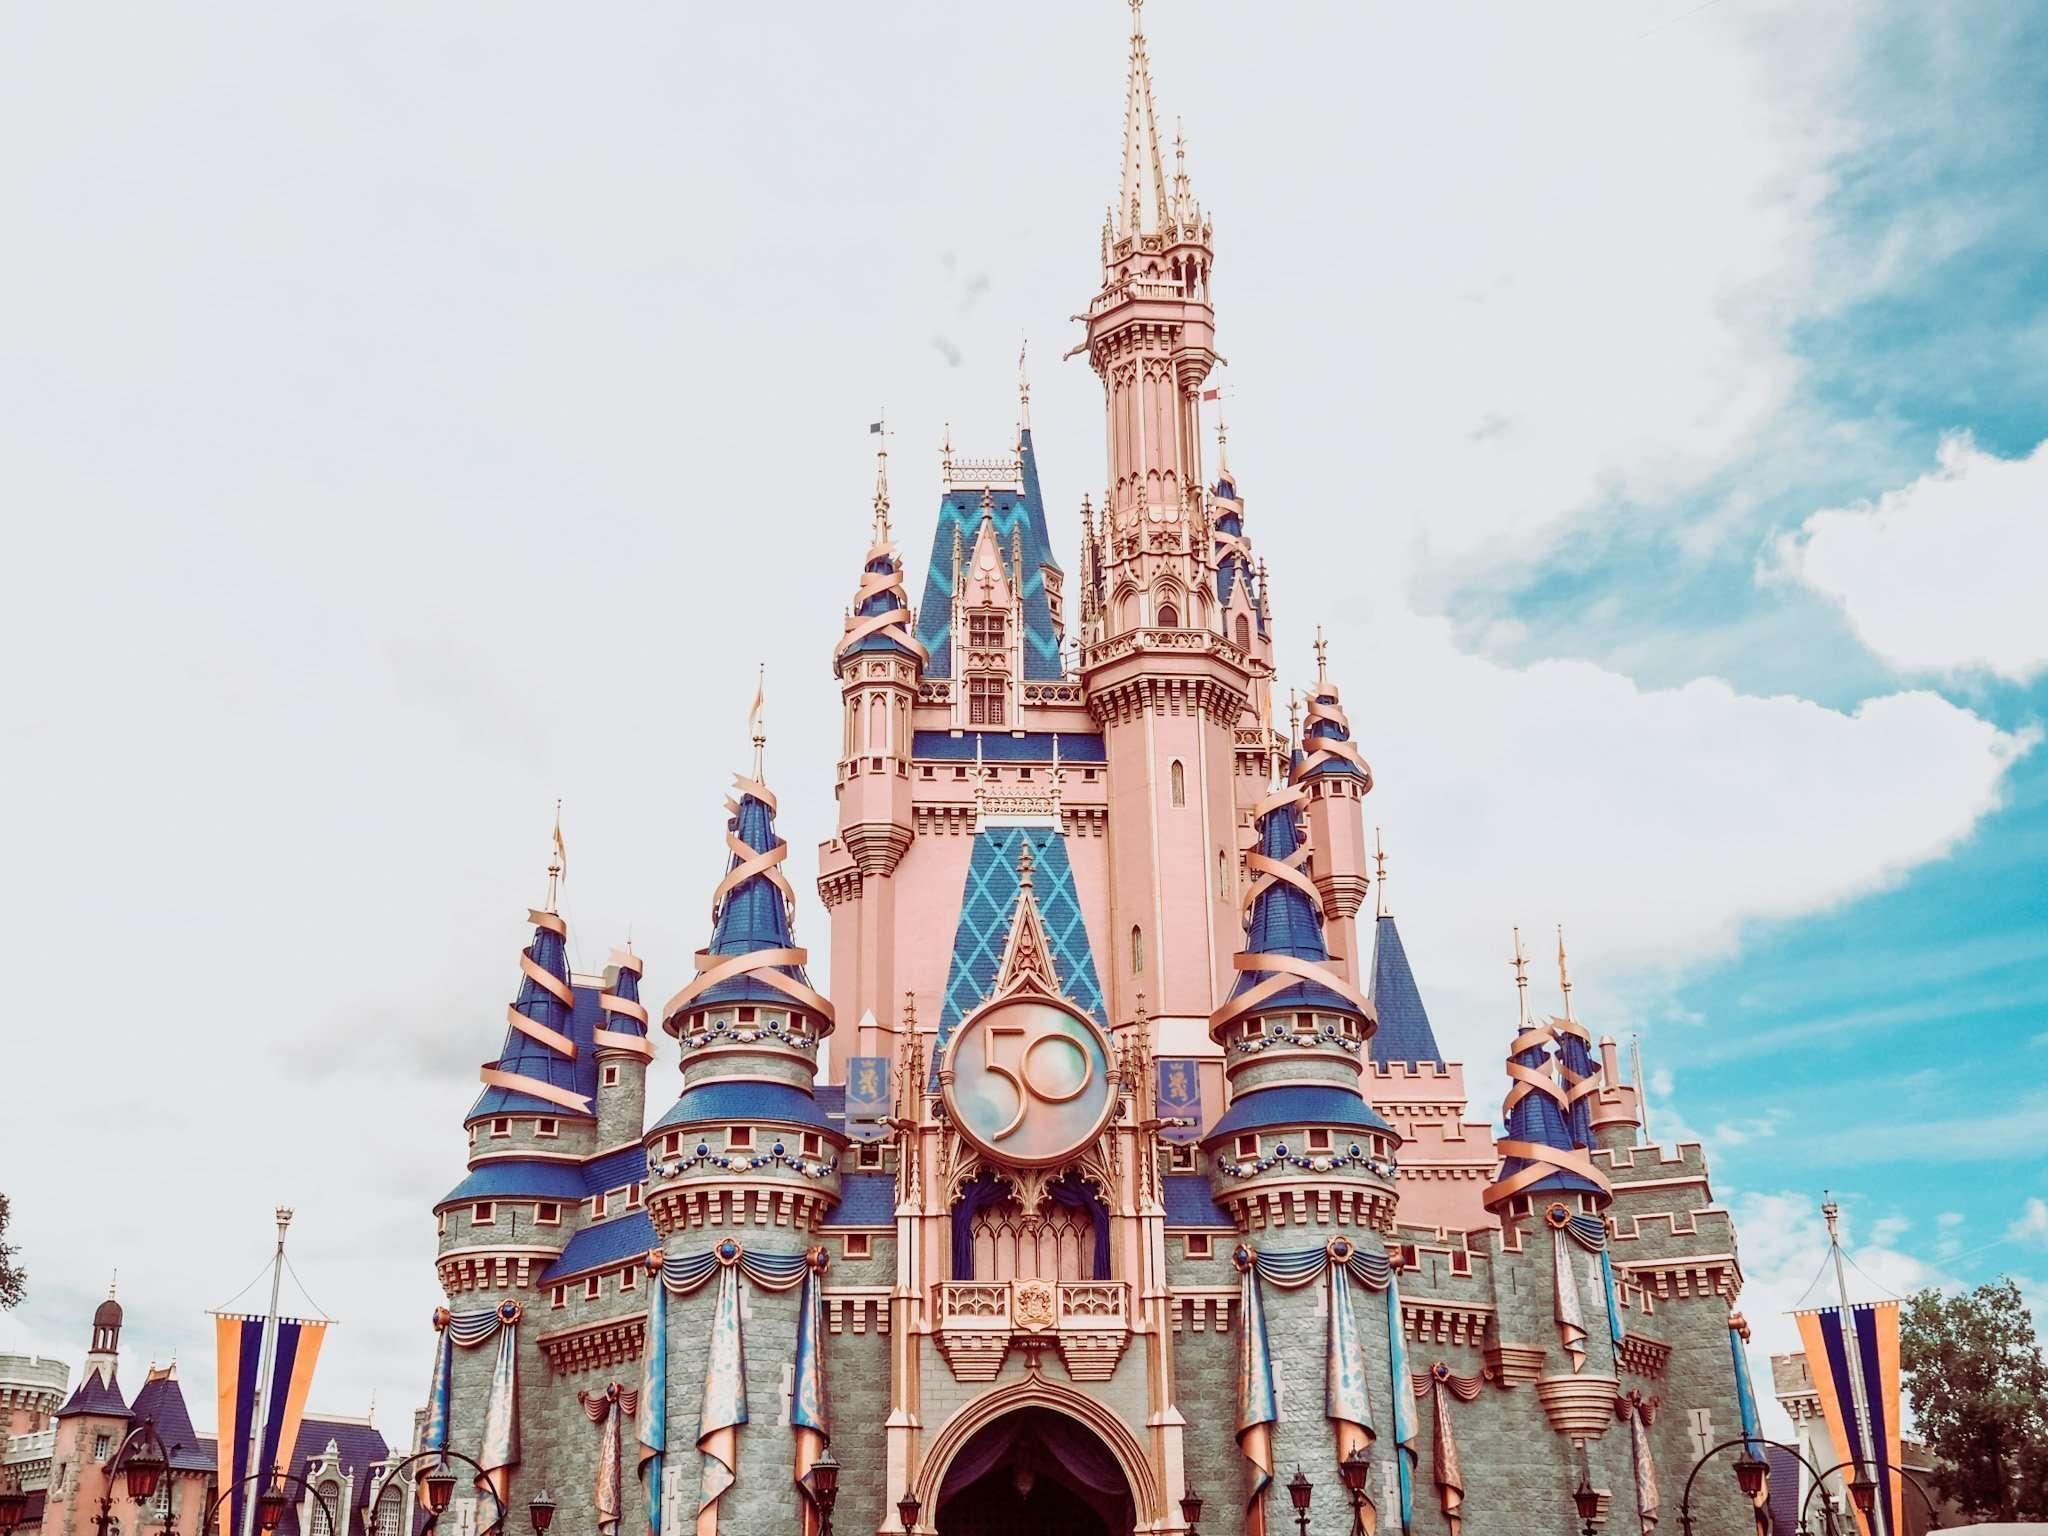 Walt Disney World's 50th Anniversary 2021 The World's Most Magical Celebration